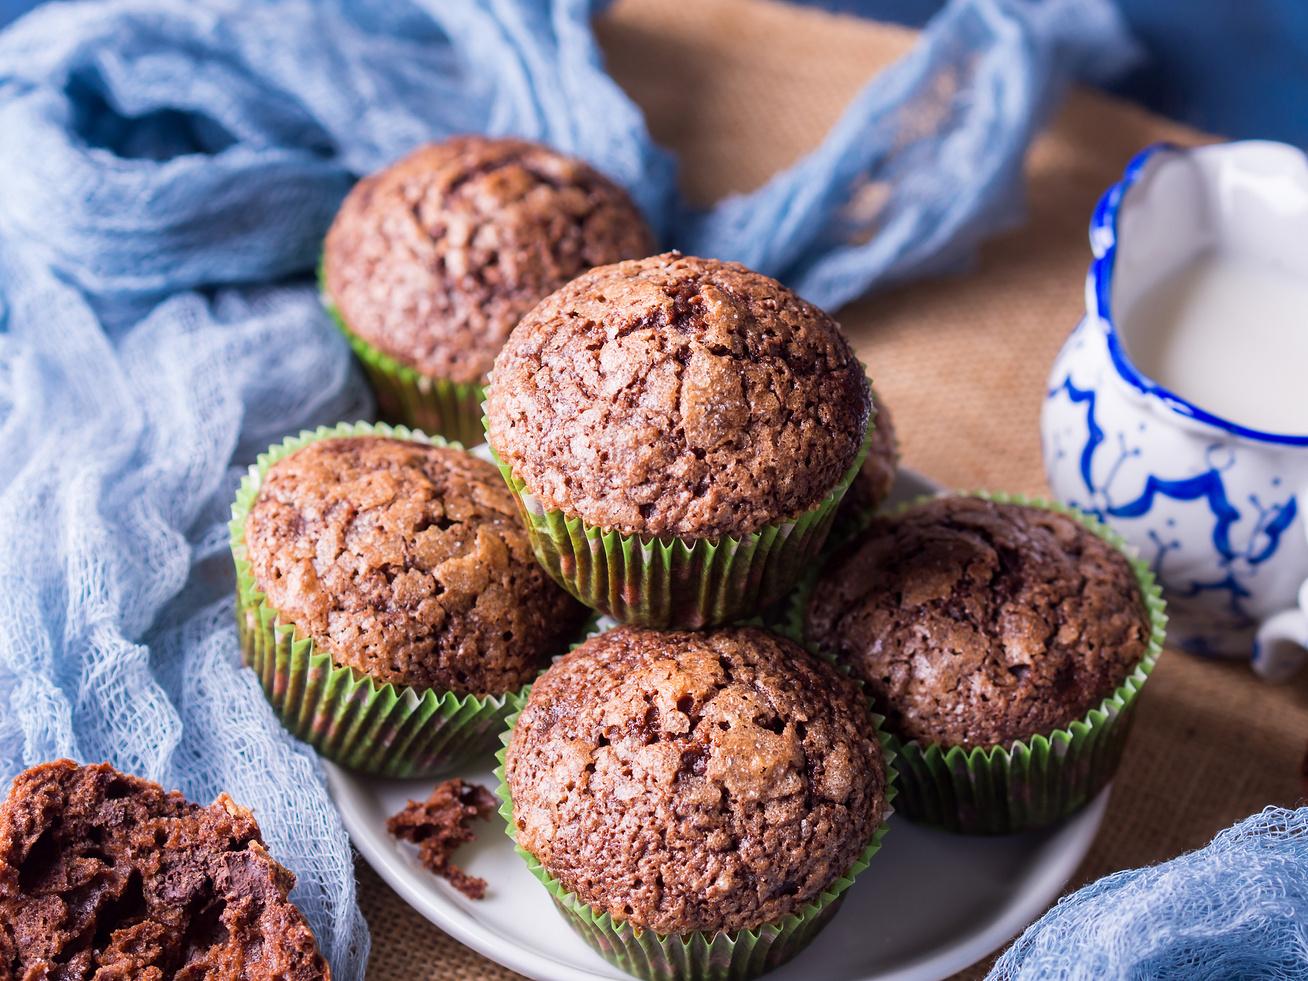 csokis-gesztenyes-muffin